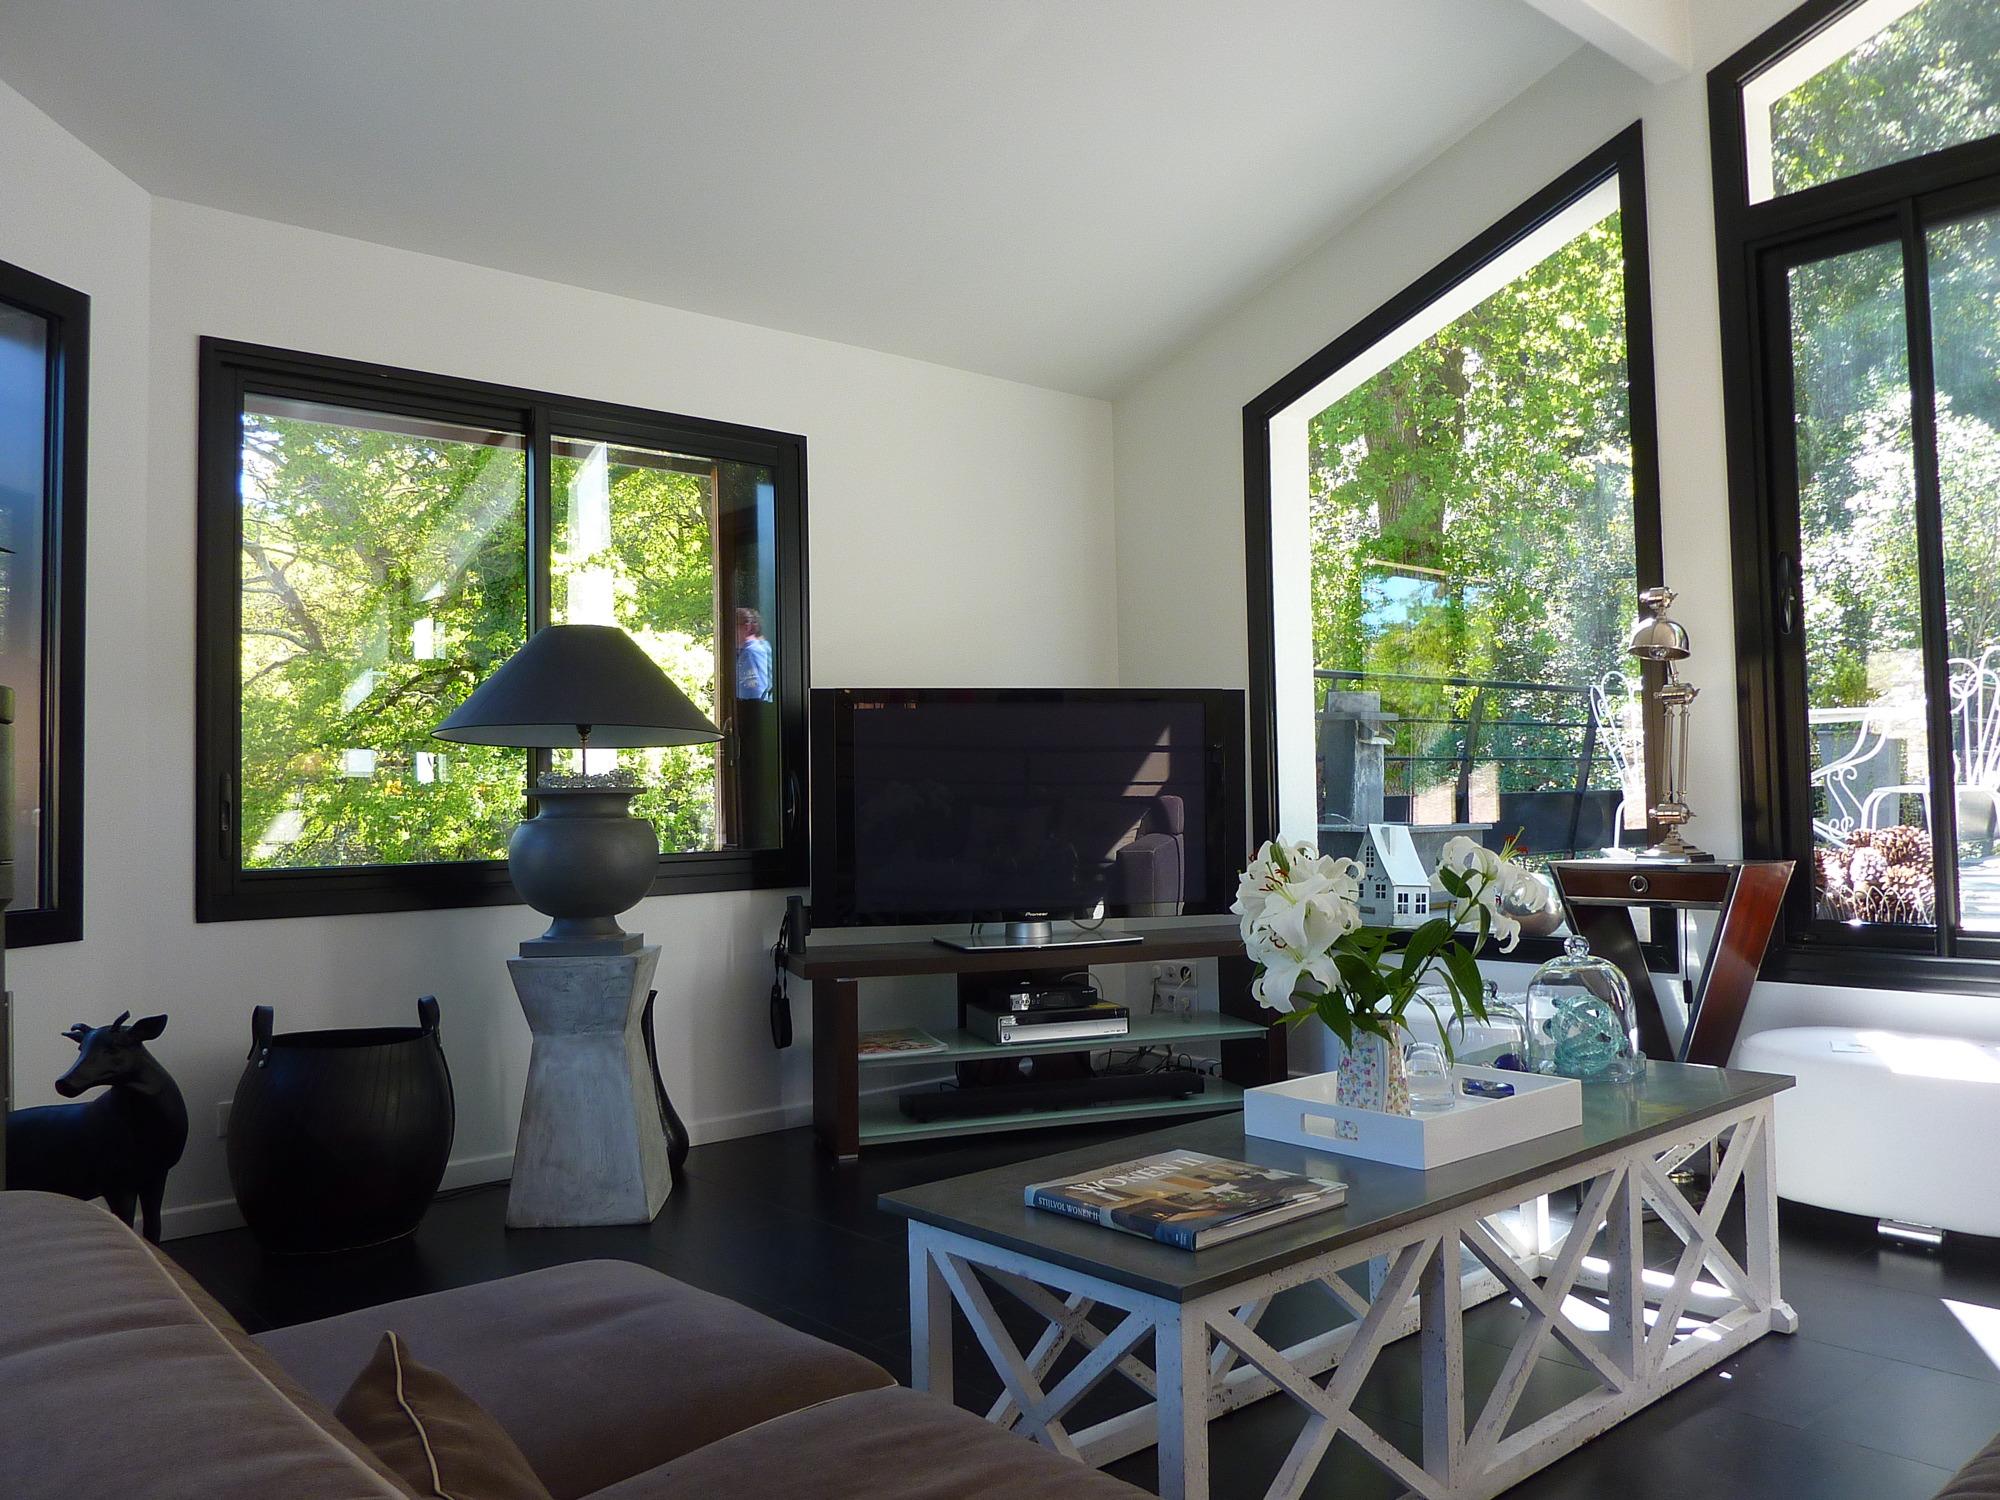 Pyla sur Mer, villa d'architecte très lumineuse avec grande terrasse à vendre